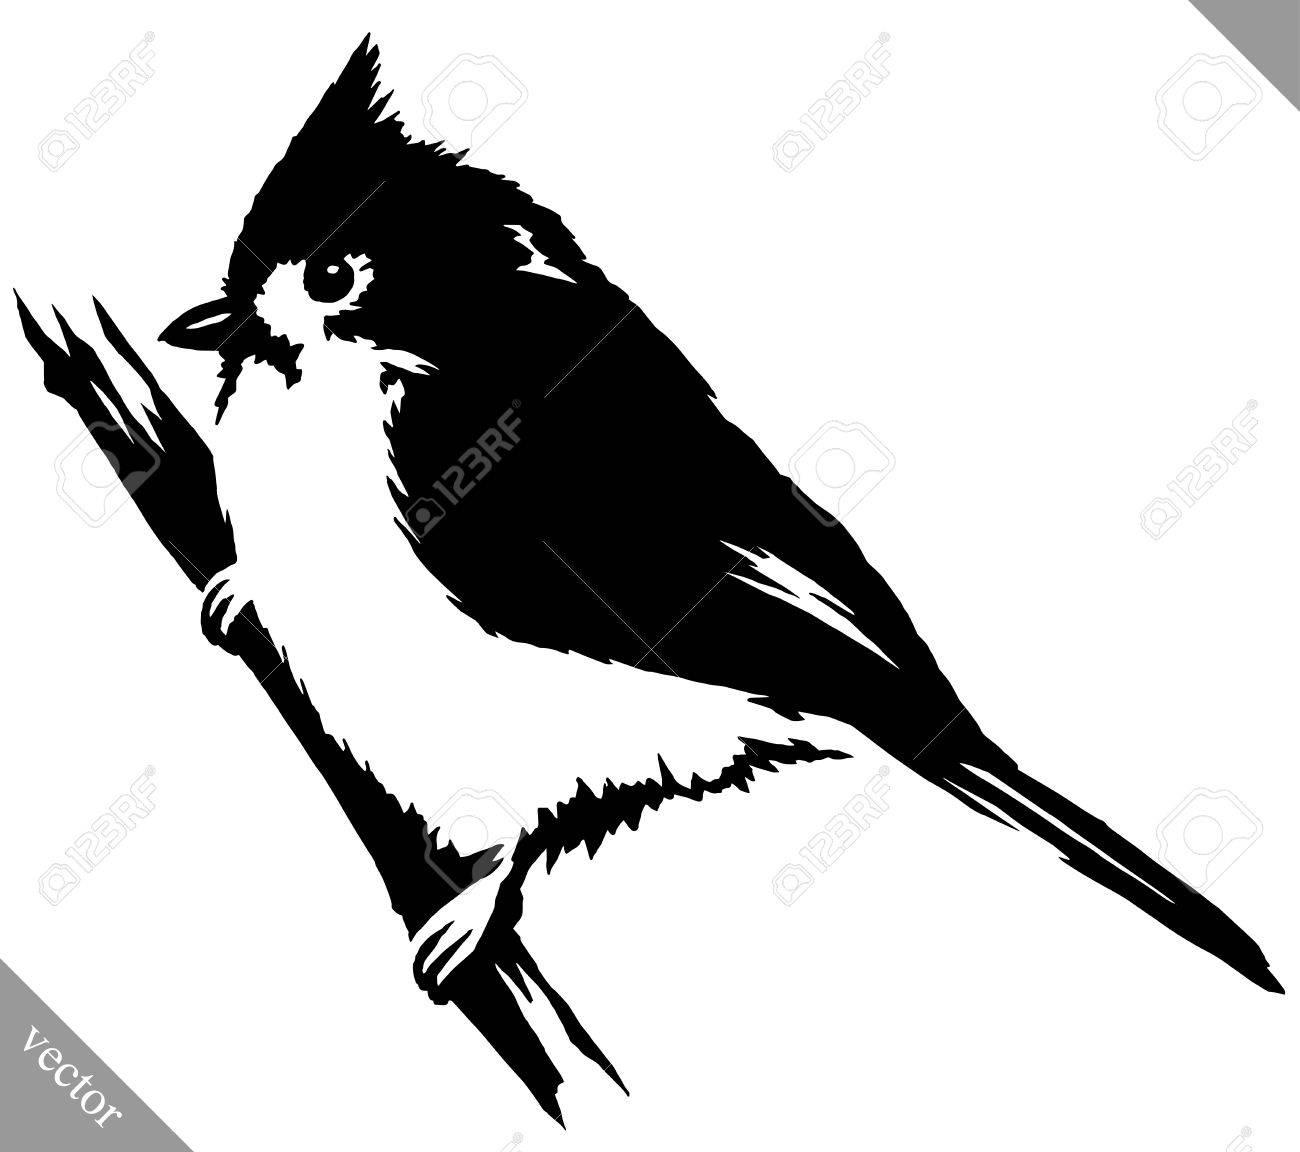 Schwarz Weiß Lineare Farbe Kardinal Vogel Vektor Illustration